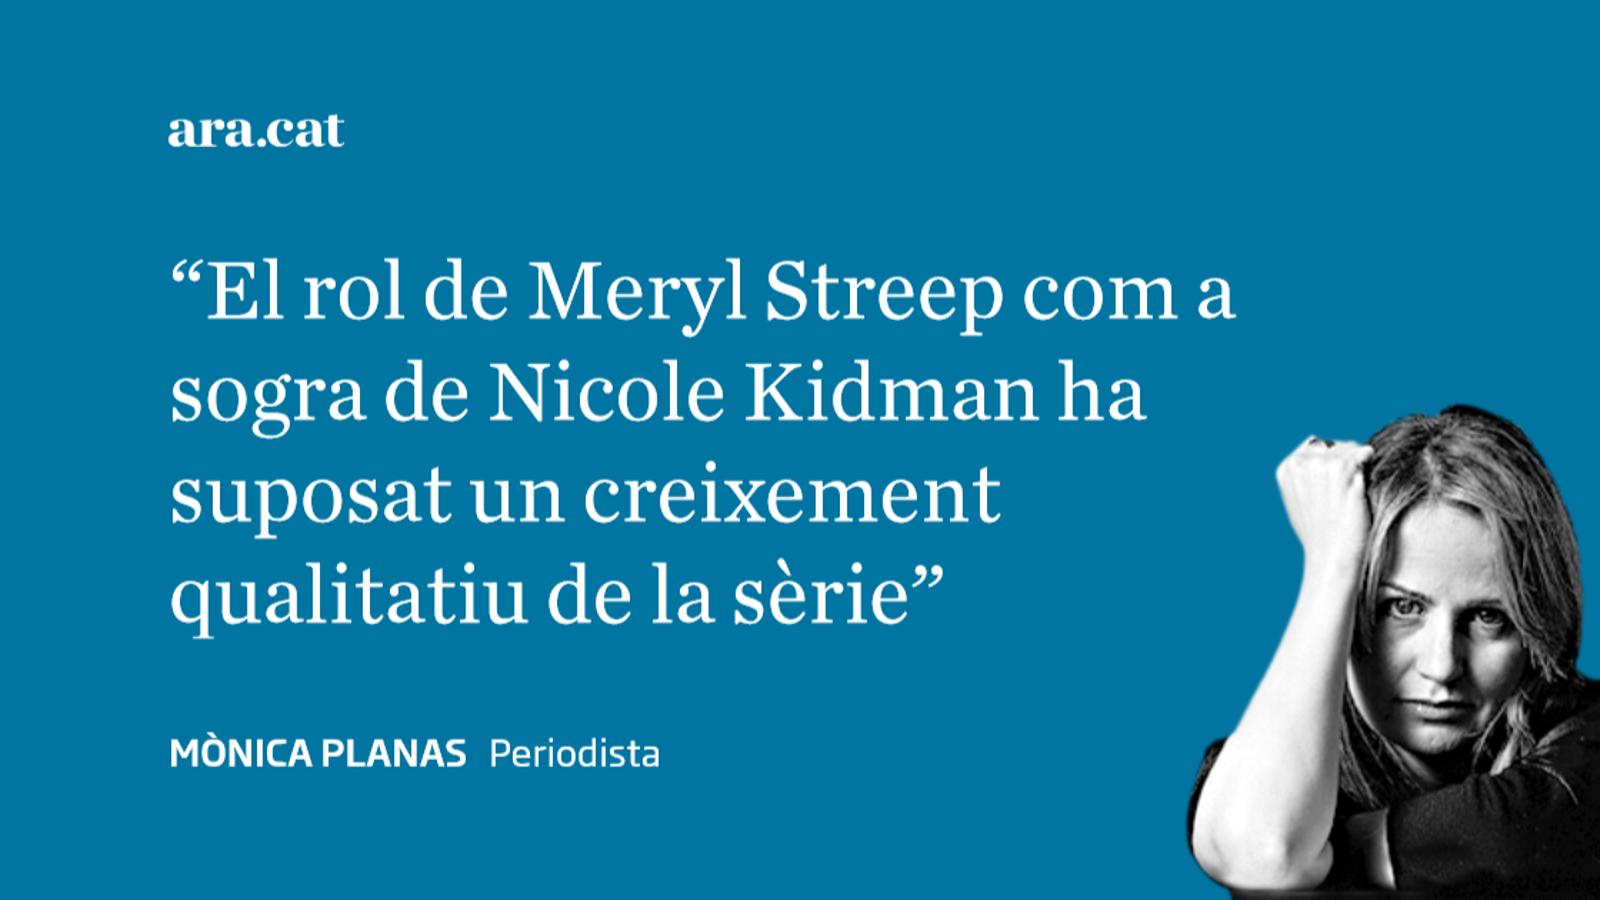 La mirada de Meryl Streep